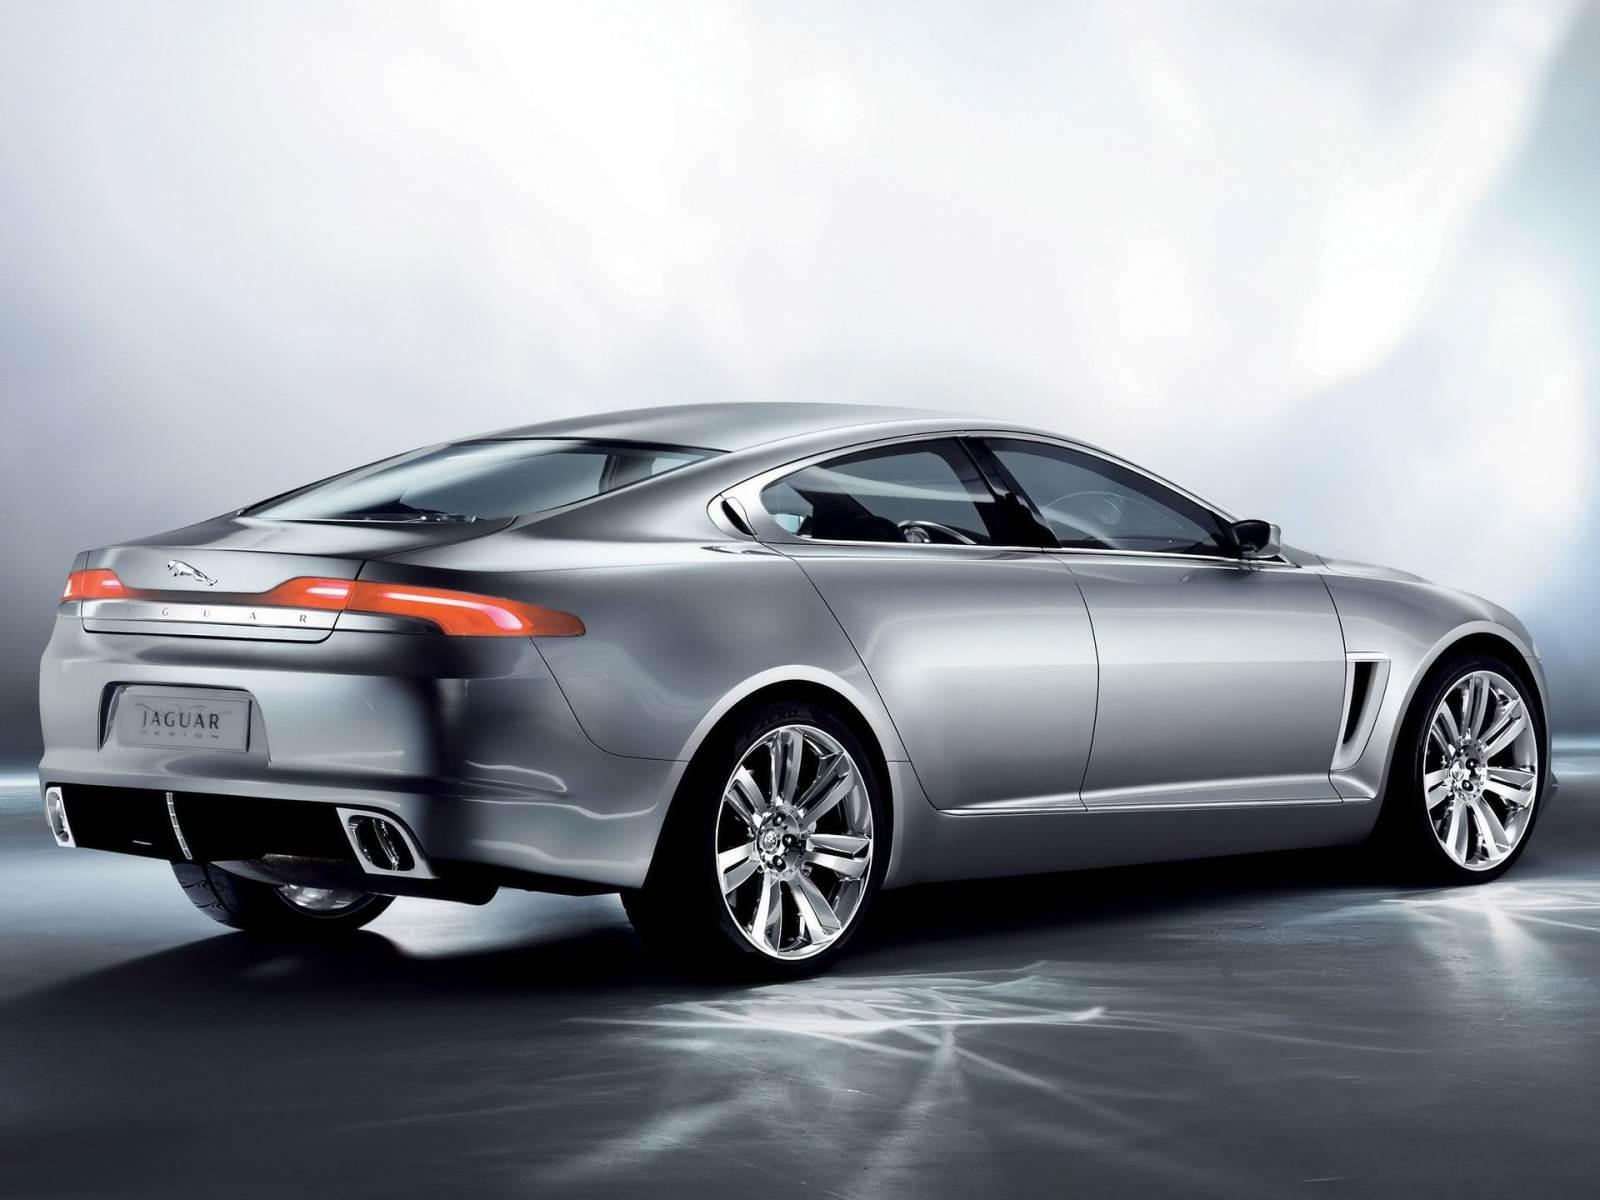 Jaguar XF Wallpapers - YL Computing